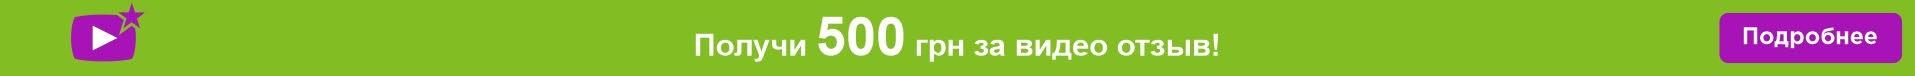 Получи 500 грн за видео отзыв